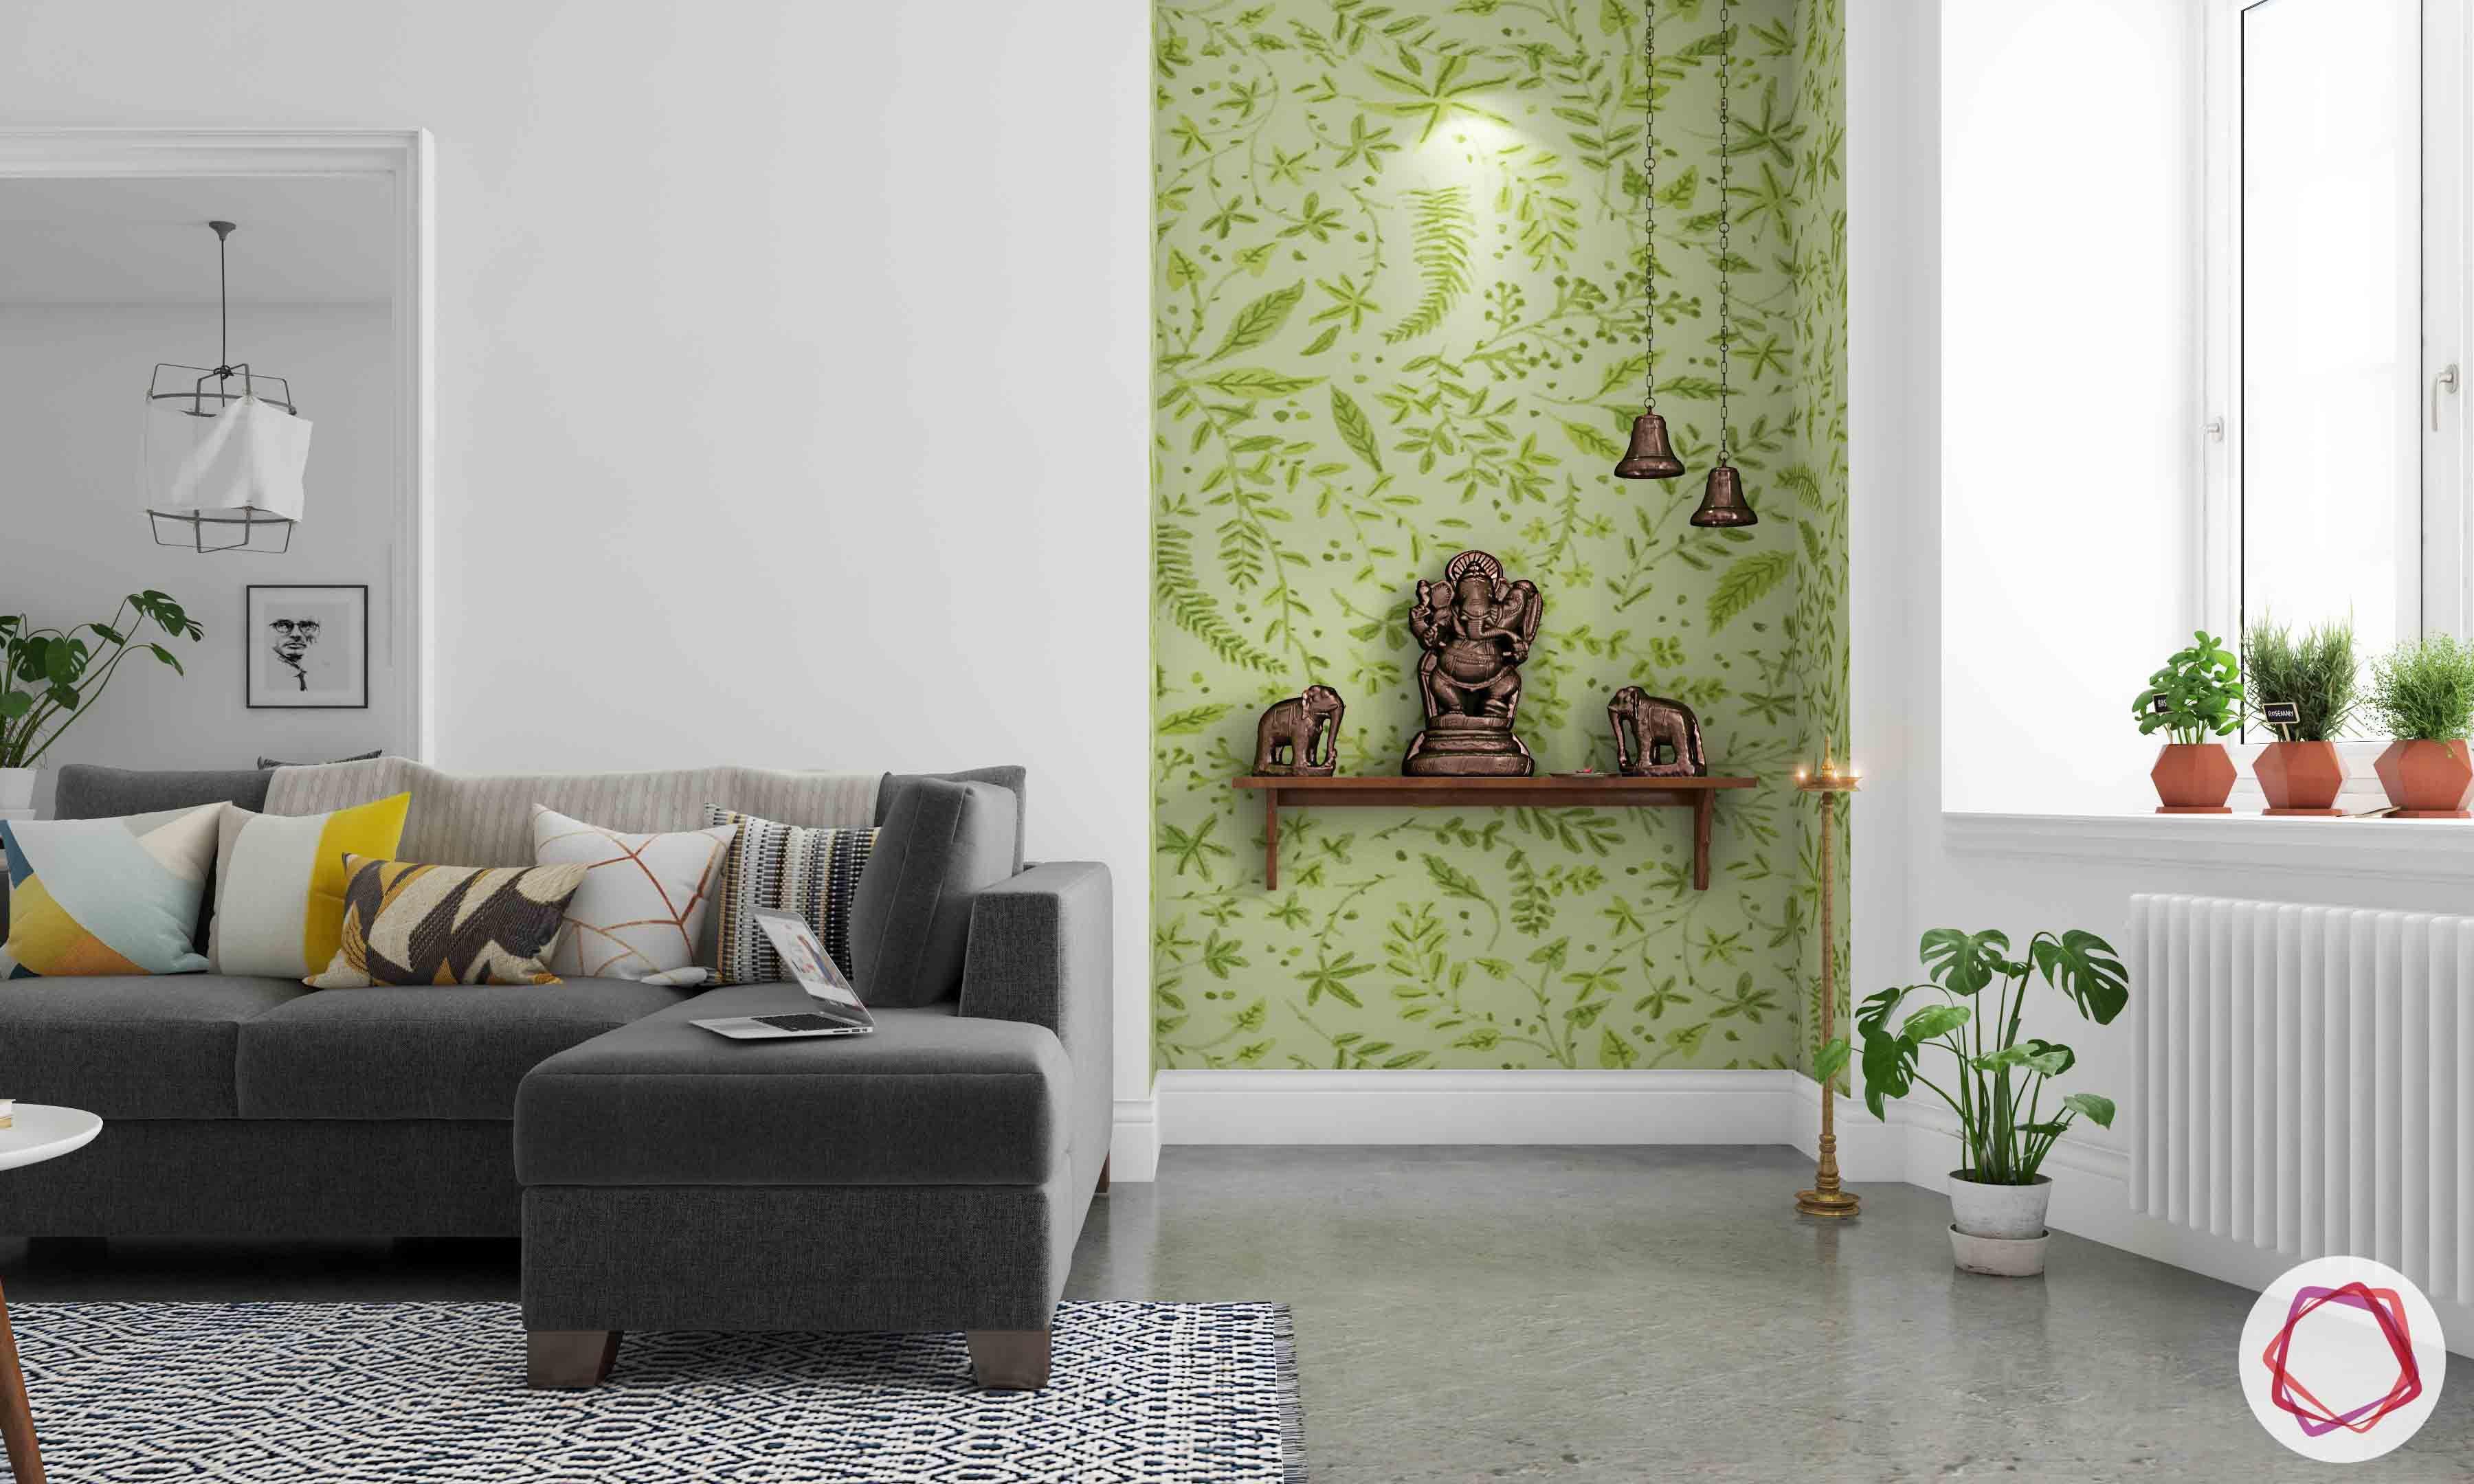 vastu colours for pooja room-green-green pooja room-wooden ledge-antique lamps